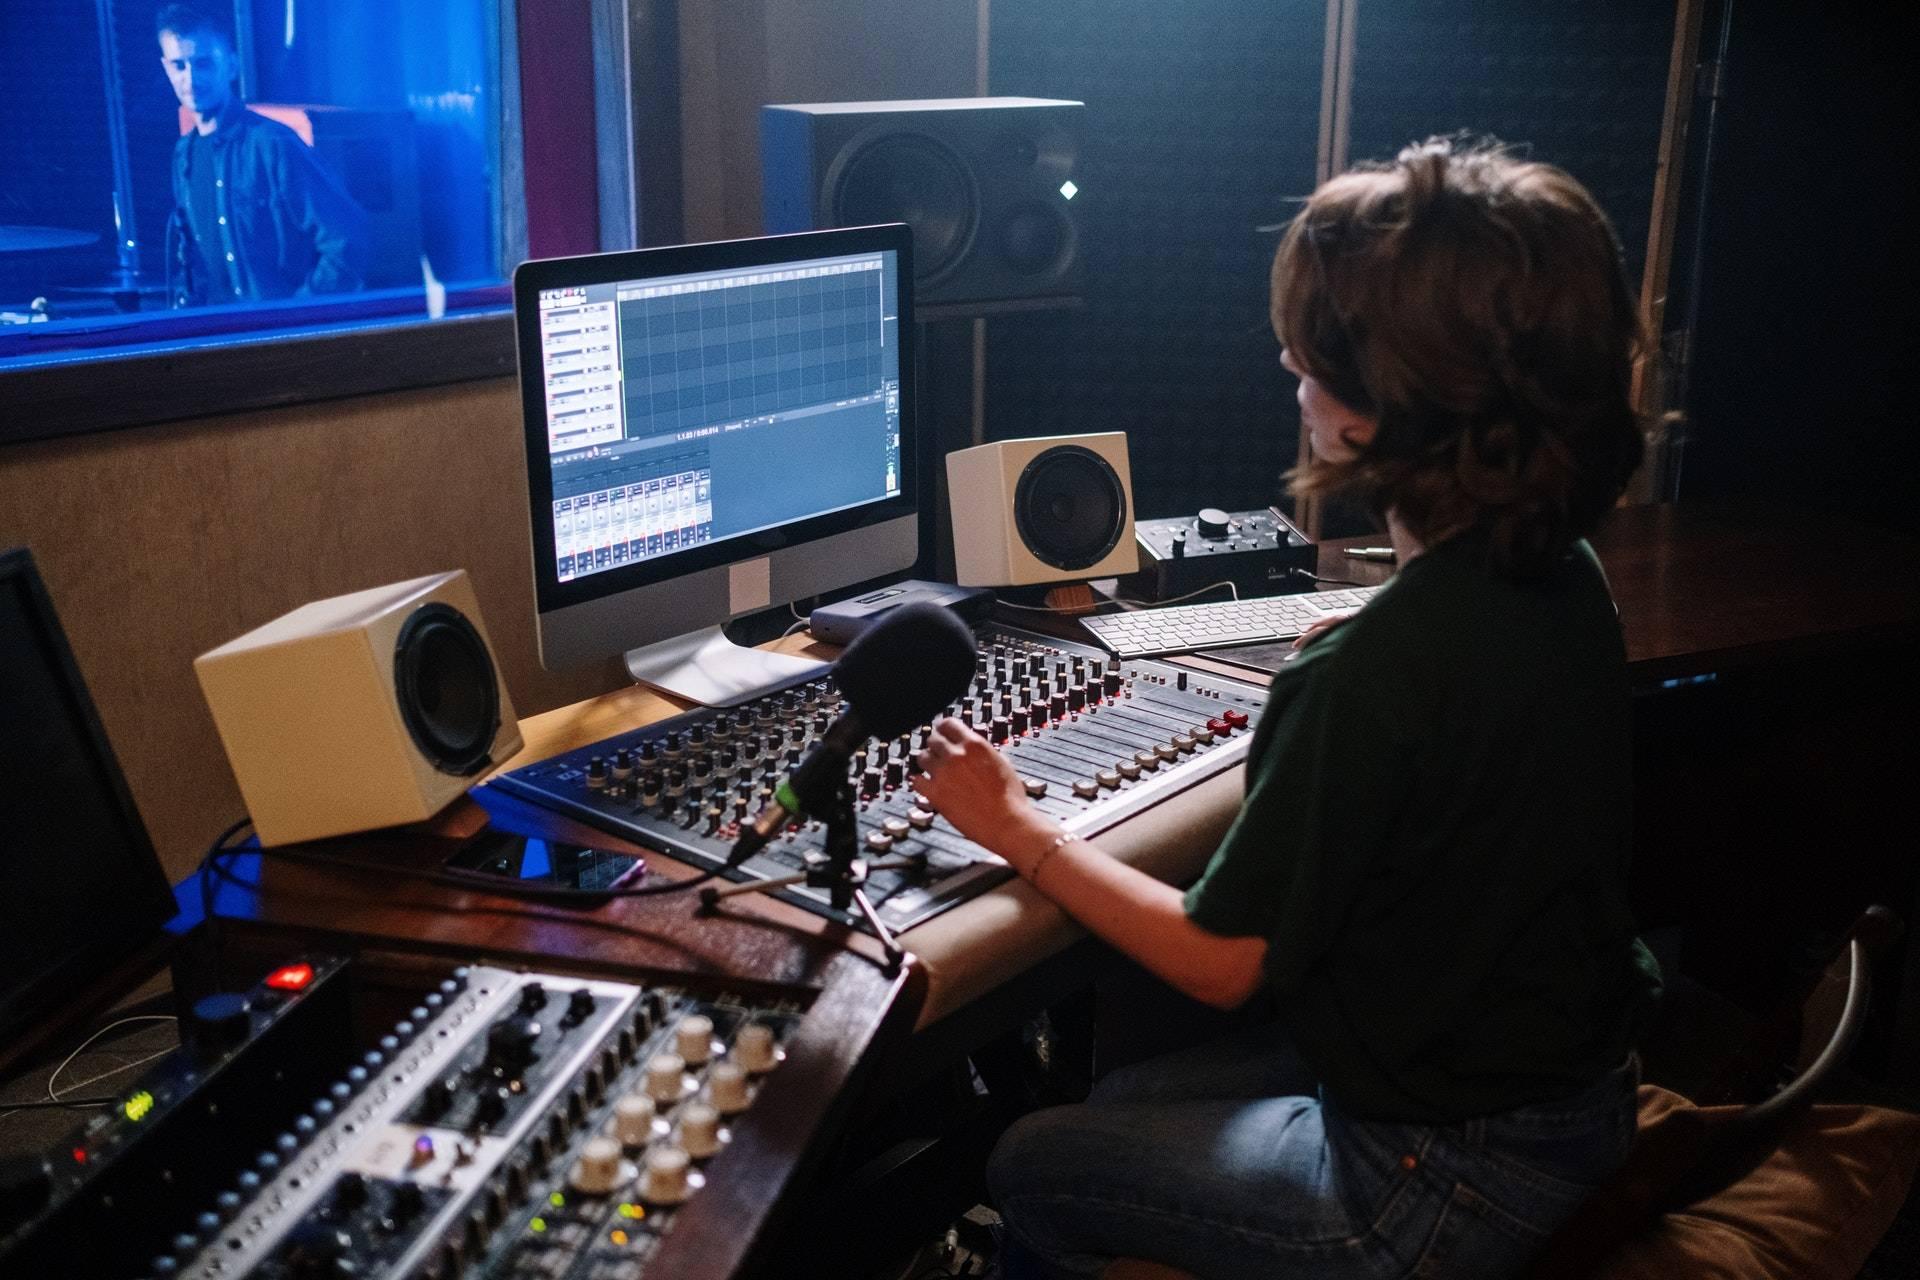 best loop kit 2021, how to make trap beats, making trap beats